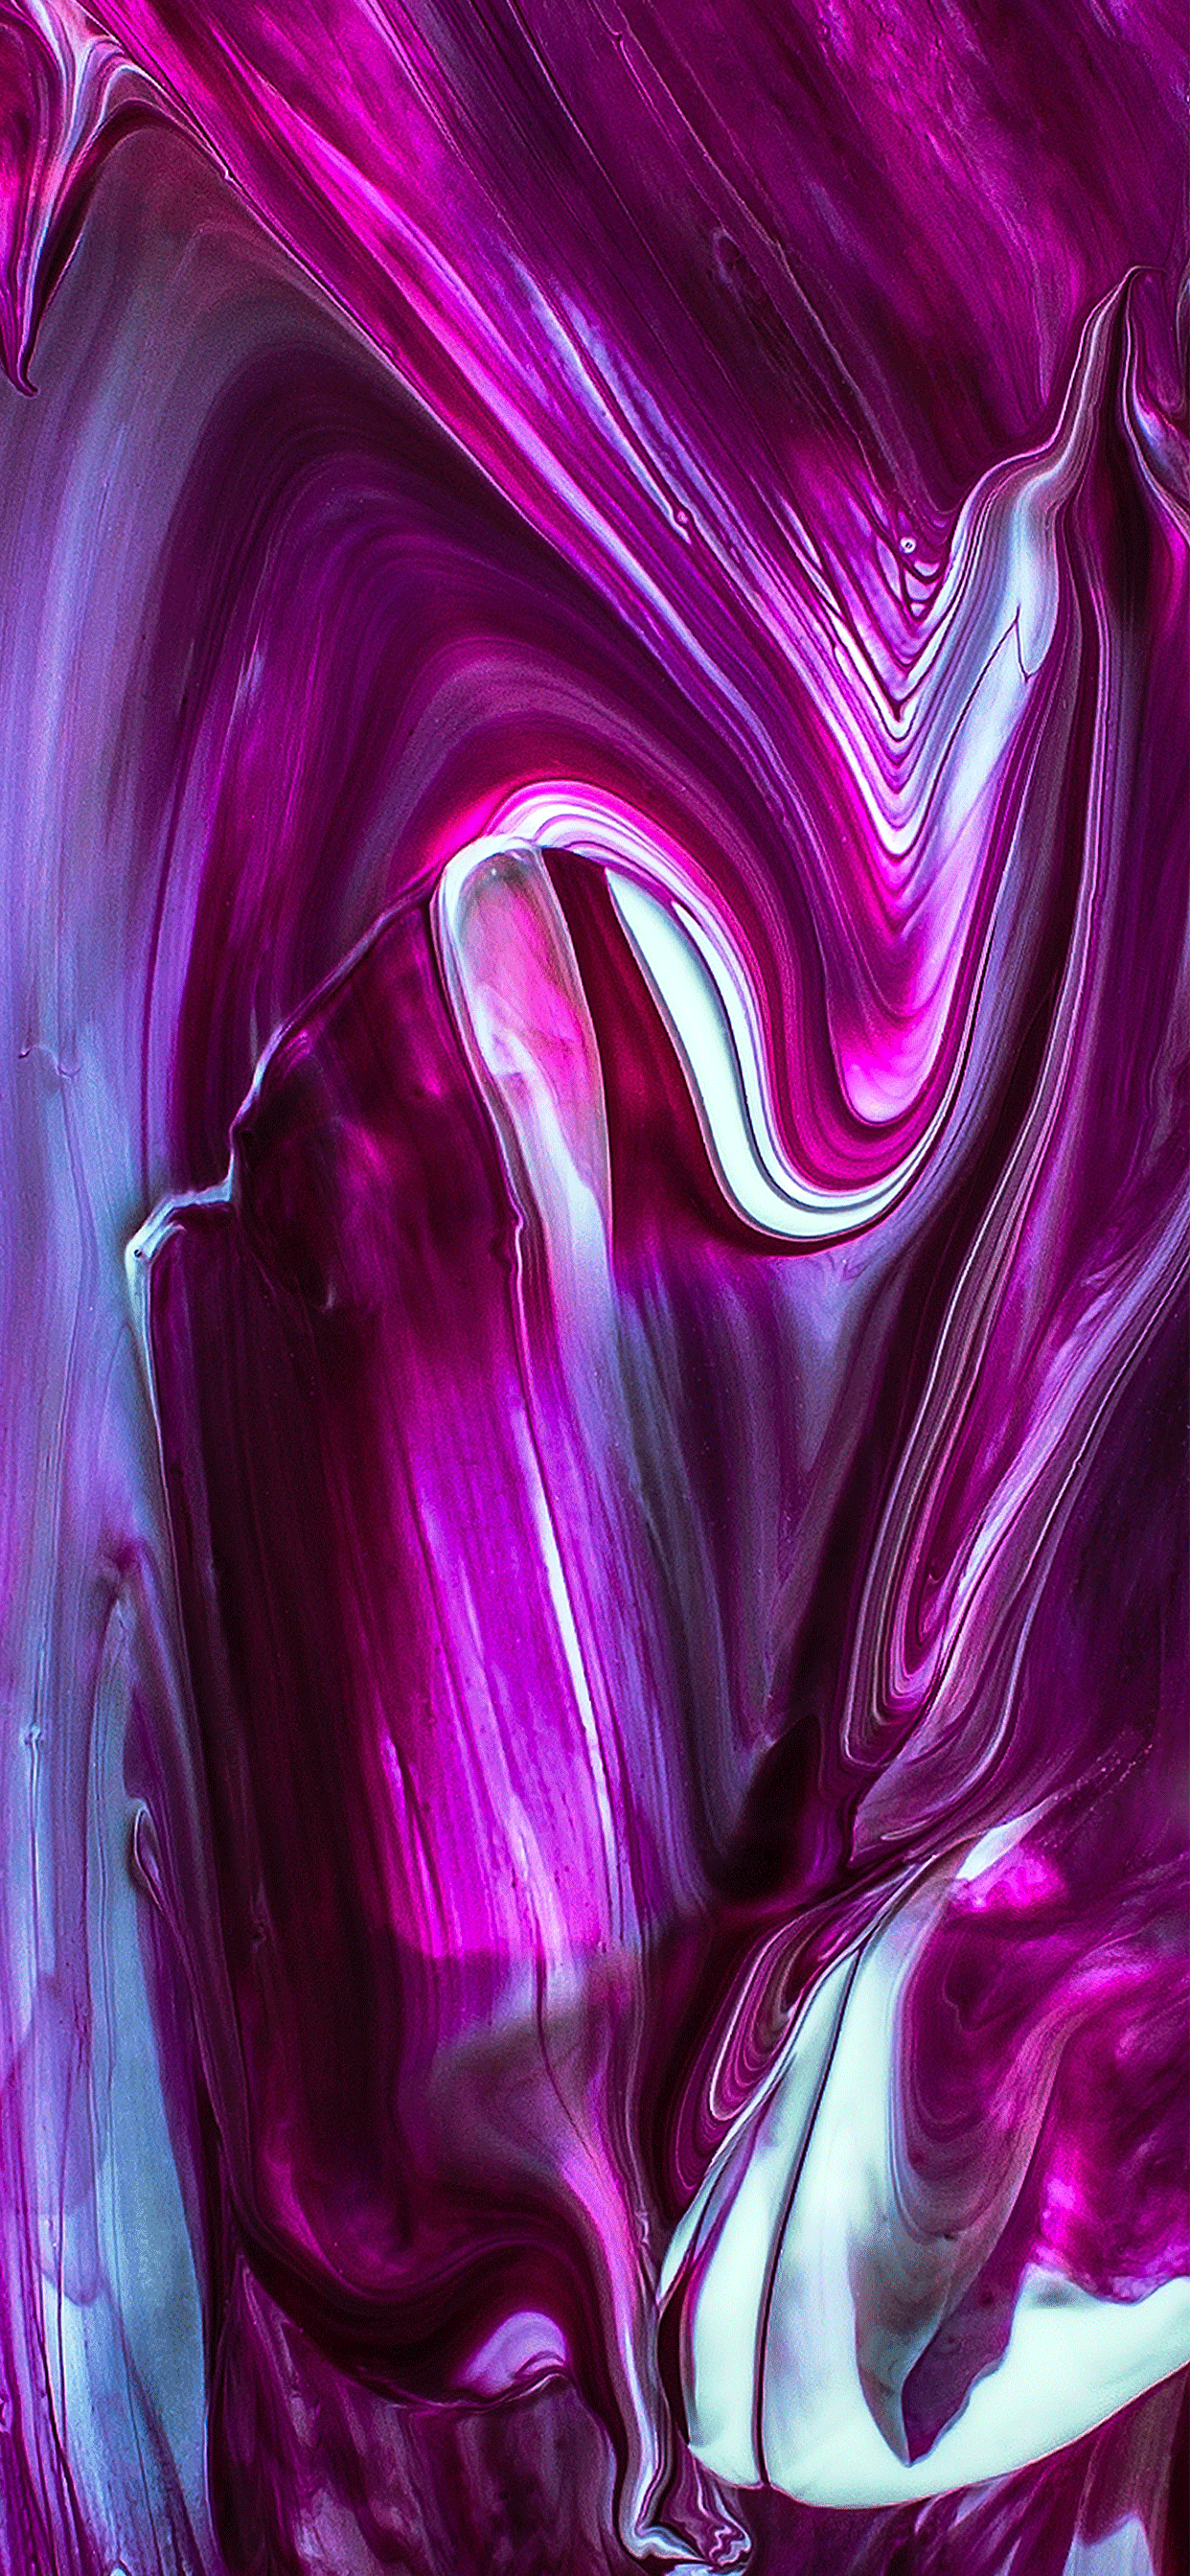 iPhone wallpaper abstract purple pattern Fonds d'écran iPhone du 30/04/2019